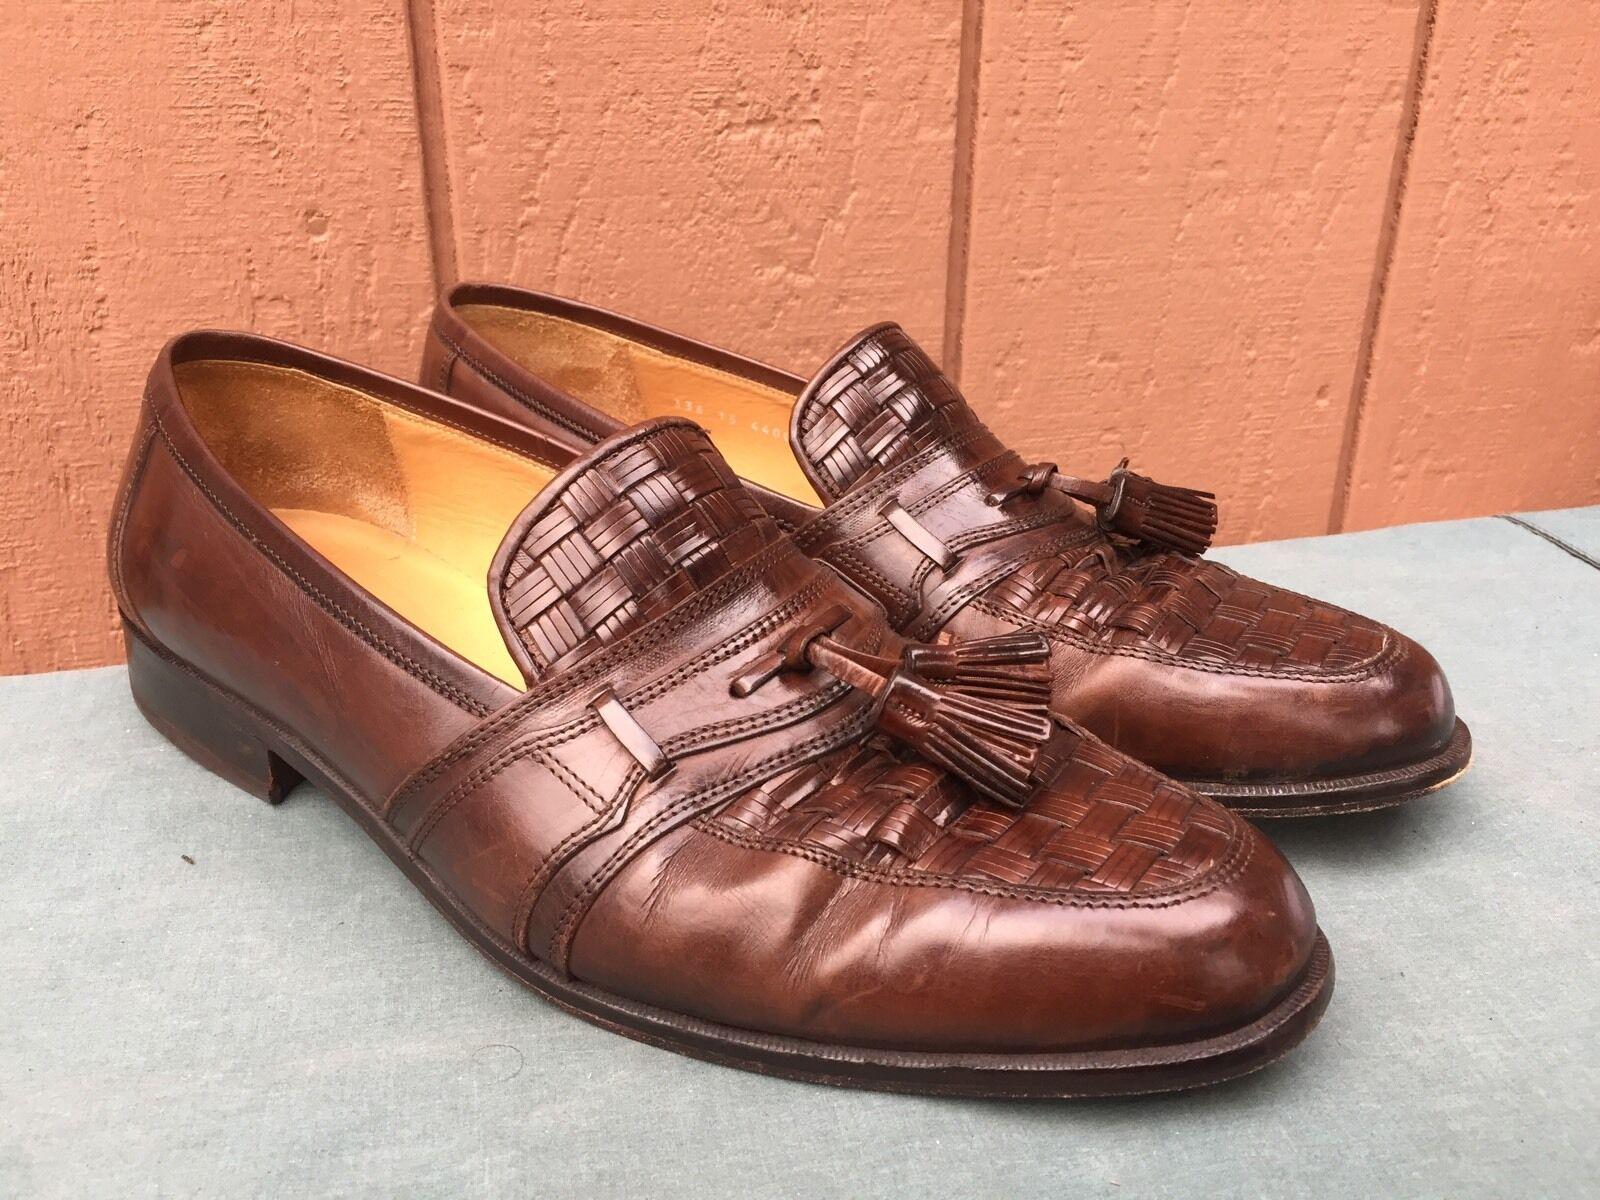 Scarpe casual da uomo EUC Johnston Murphy Cellini Woven Brown Leather Tassel Loafer Hand Made US 12 M